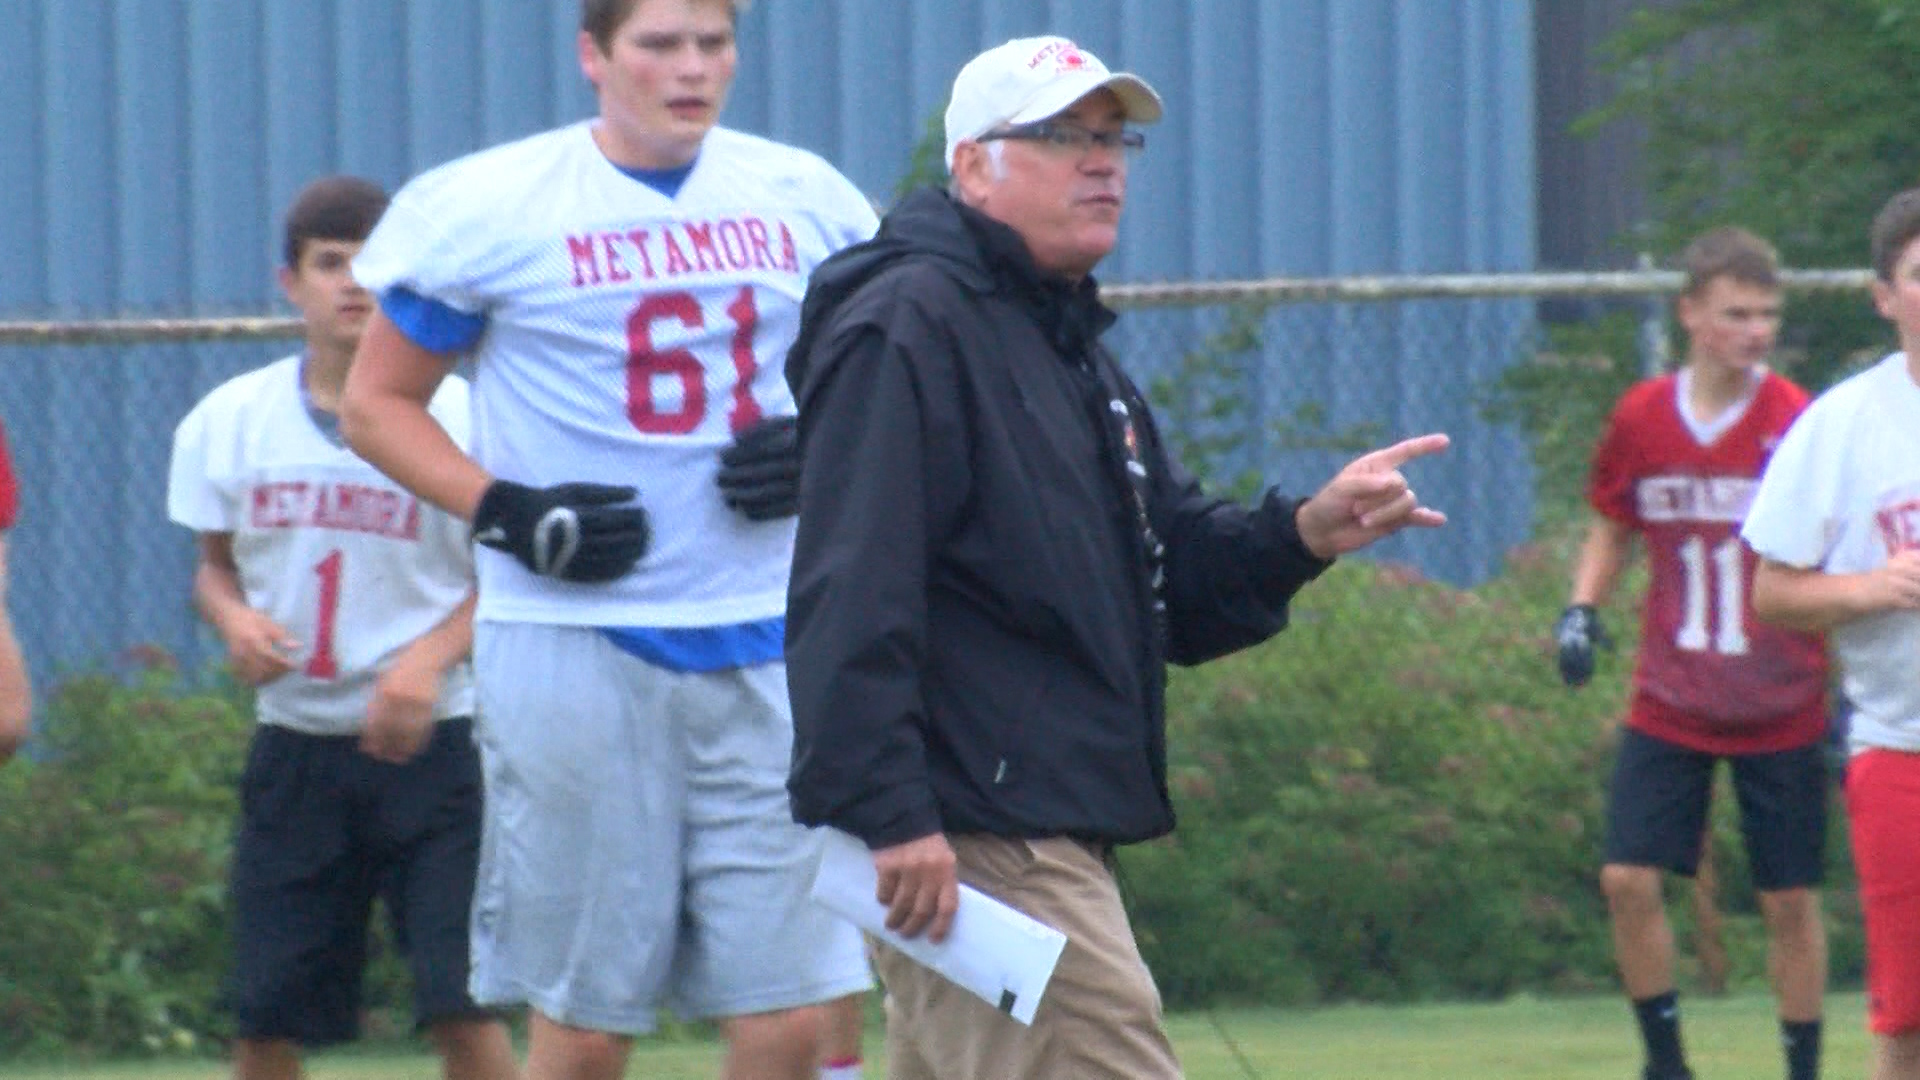 Pat Ryan (Metamora FB coach)_1502337422987.jpg